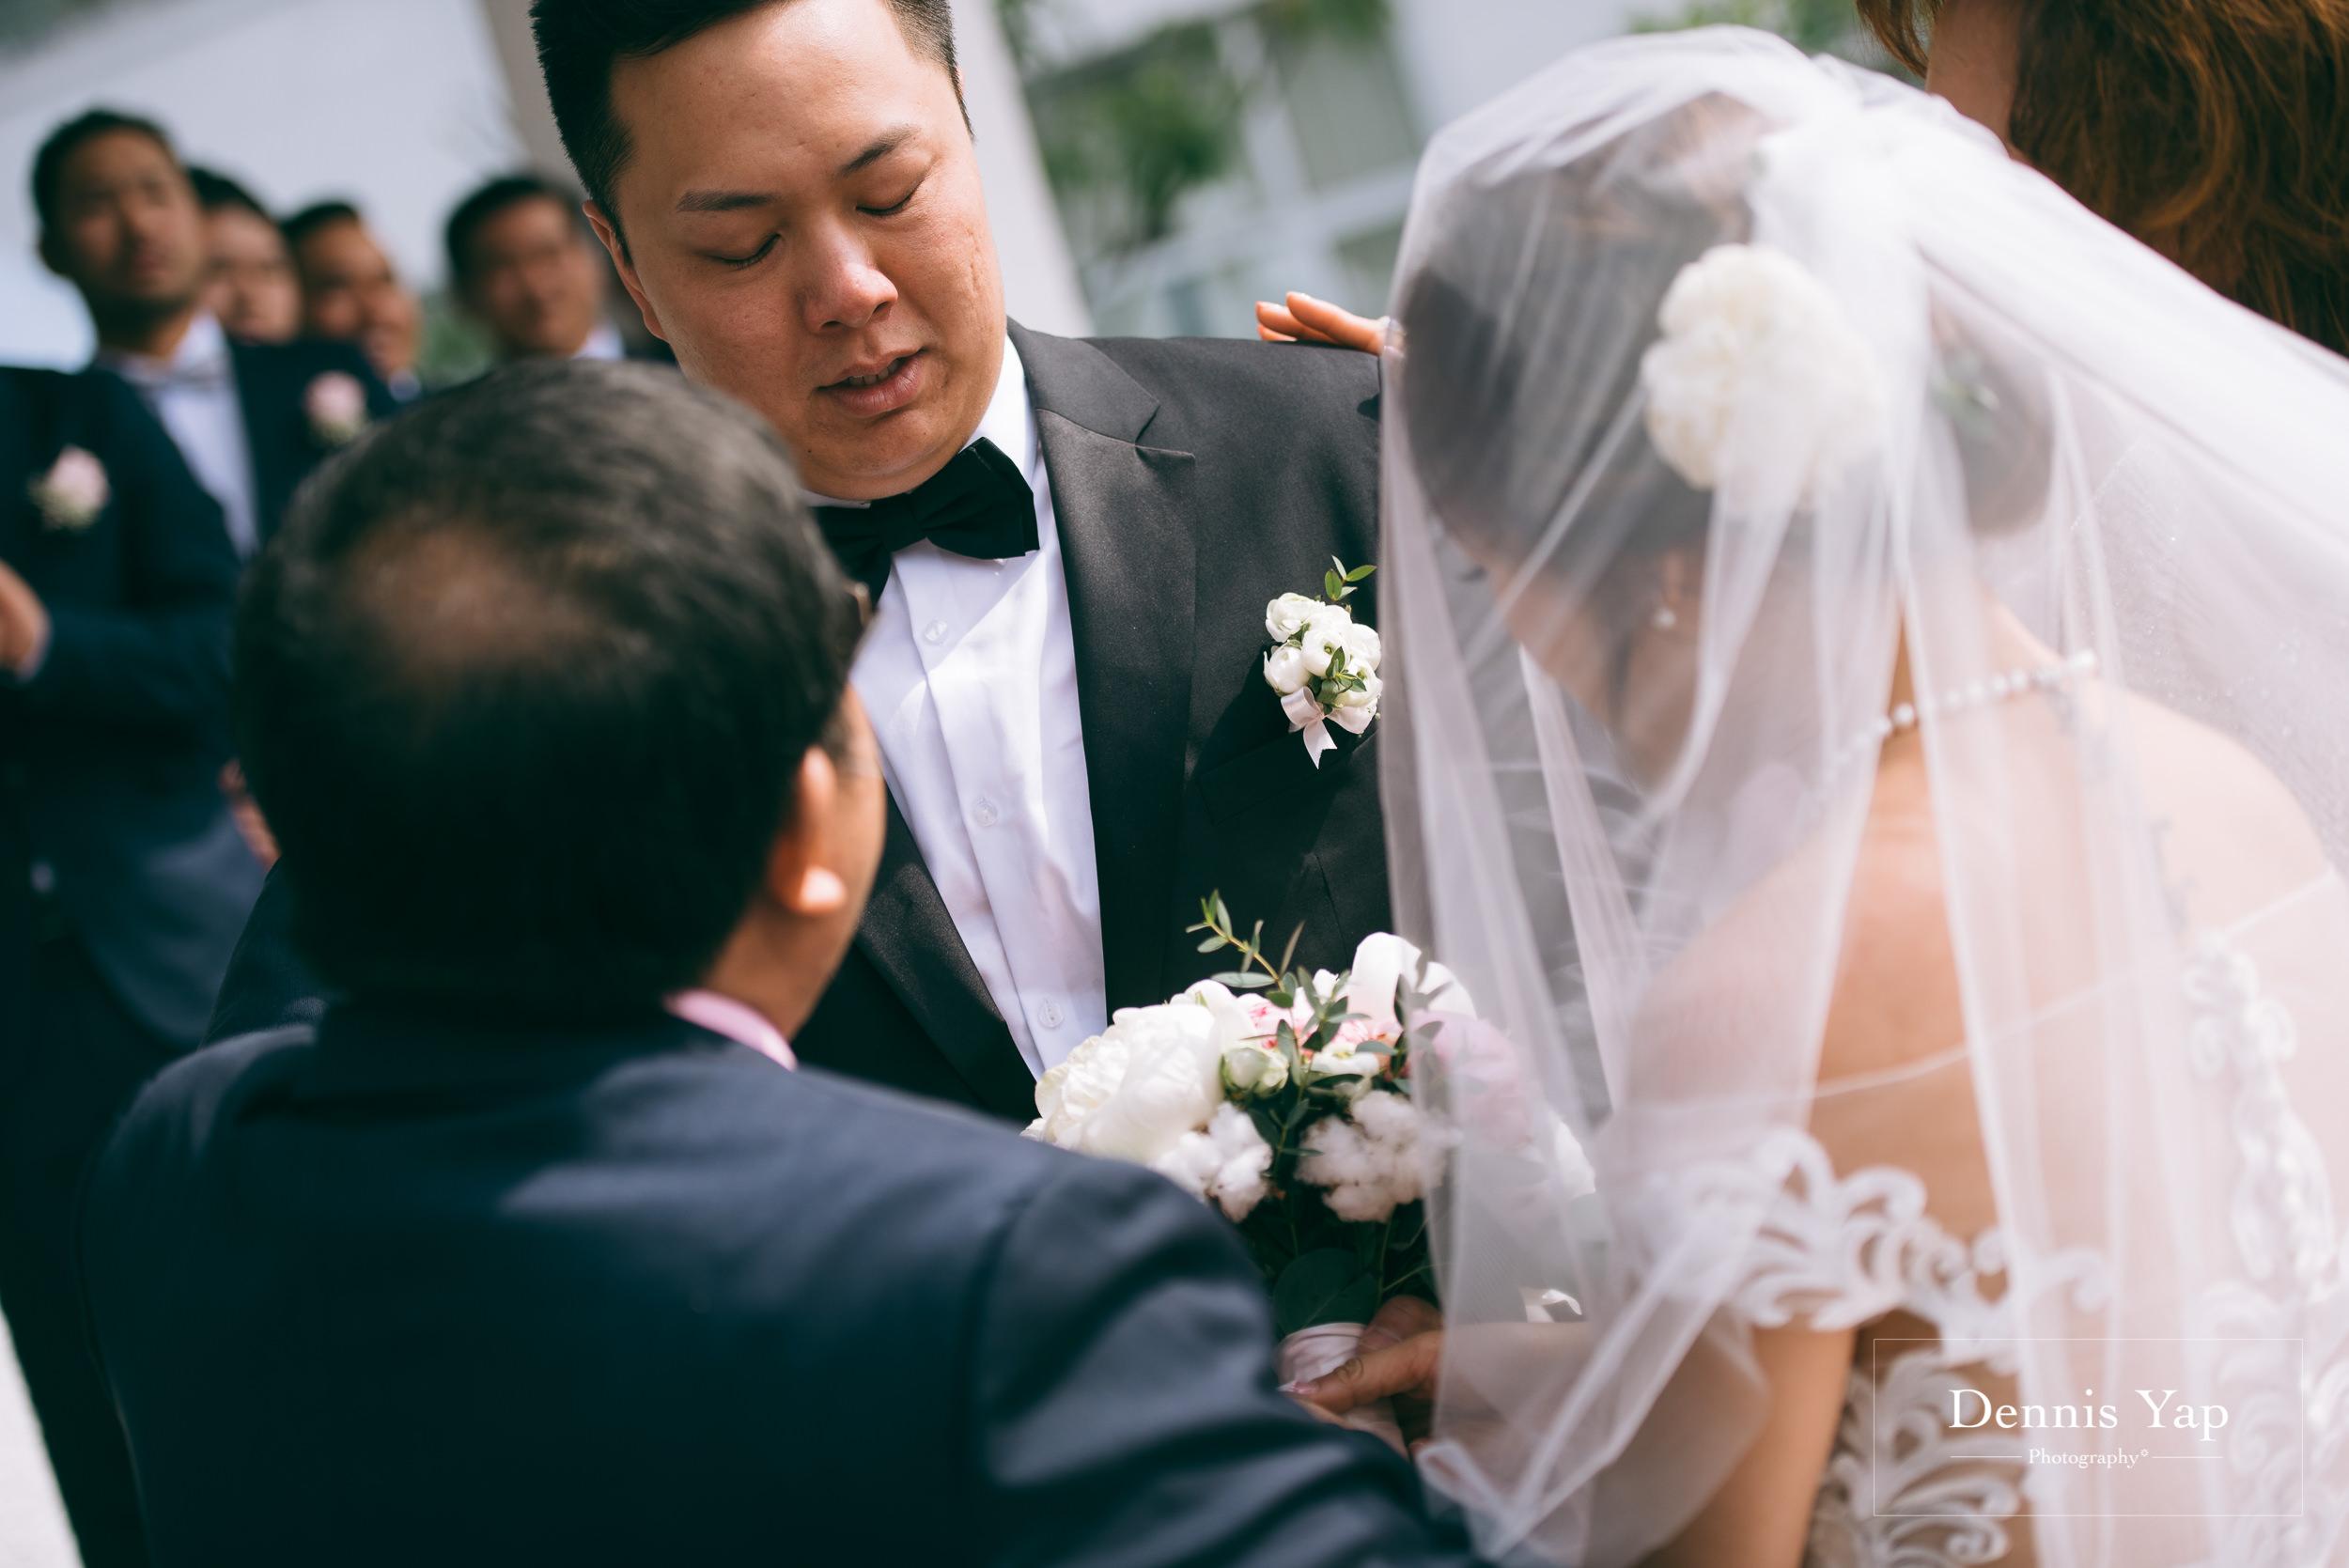 lionel joanne garden wedding majestic hotel dennis yap photography malaysia top wedding photographer-35.jpg